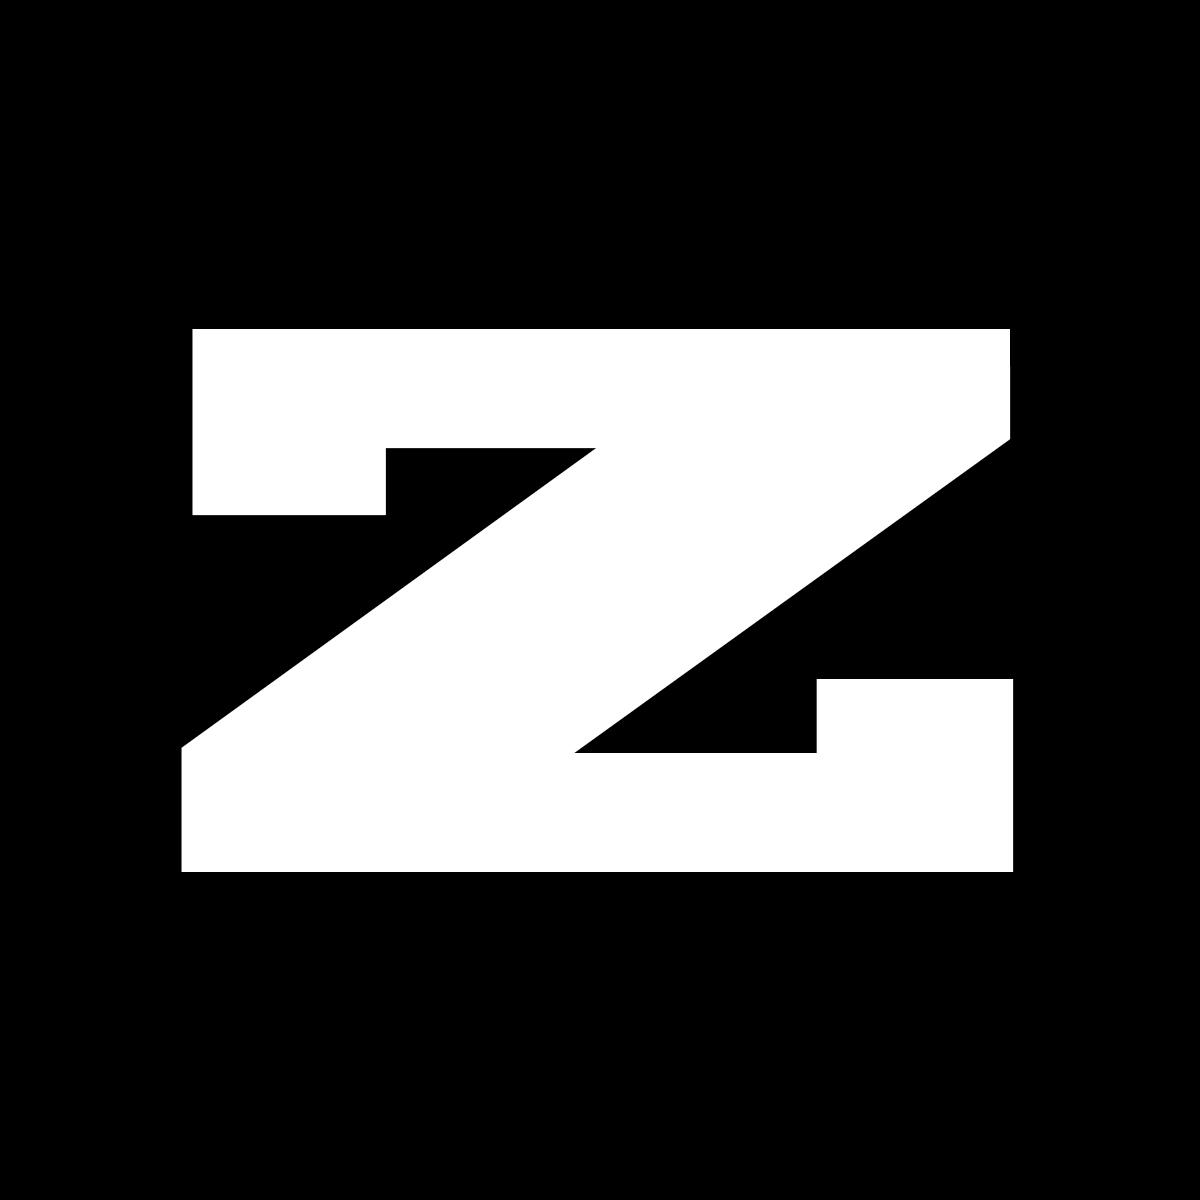 ZuSko - Tracks